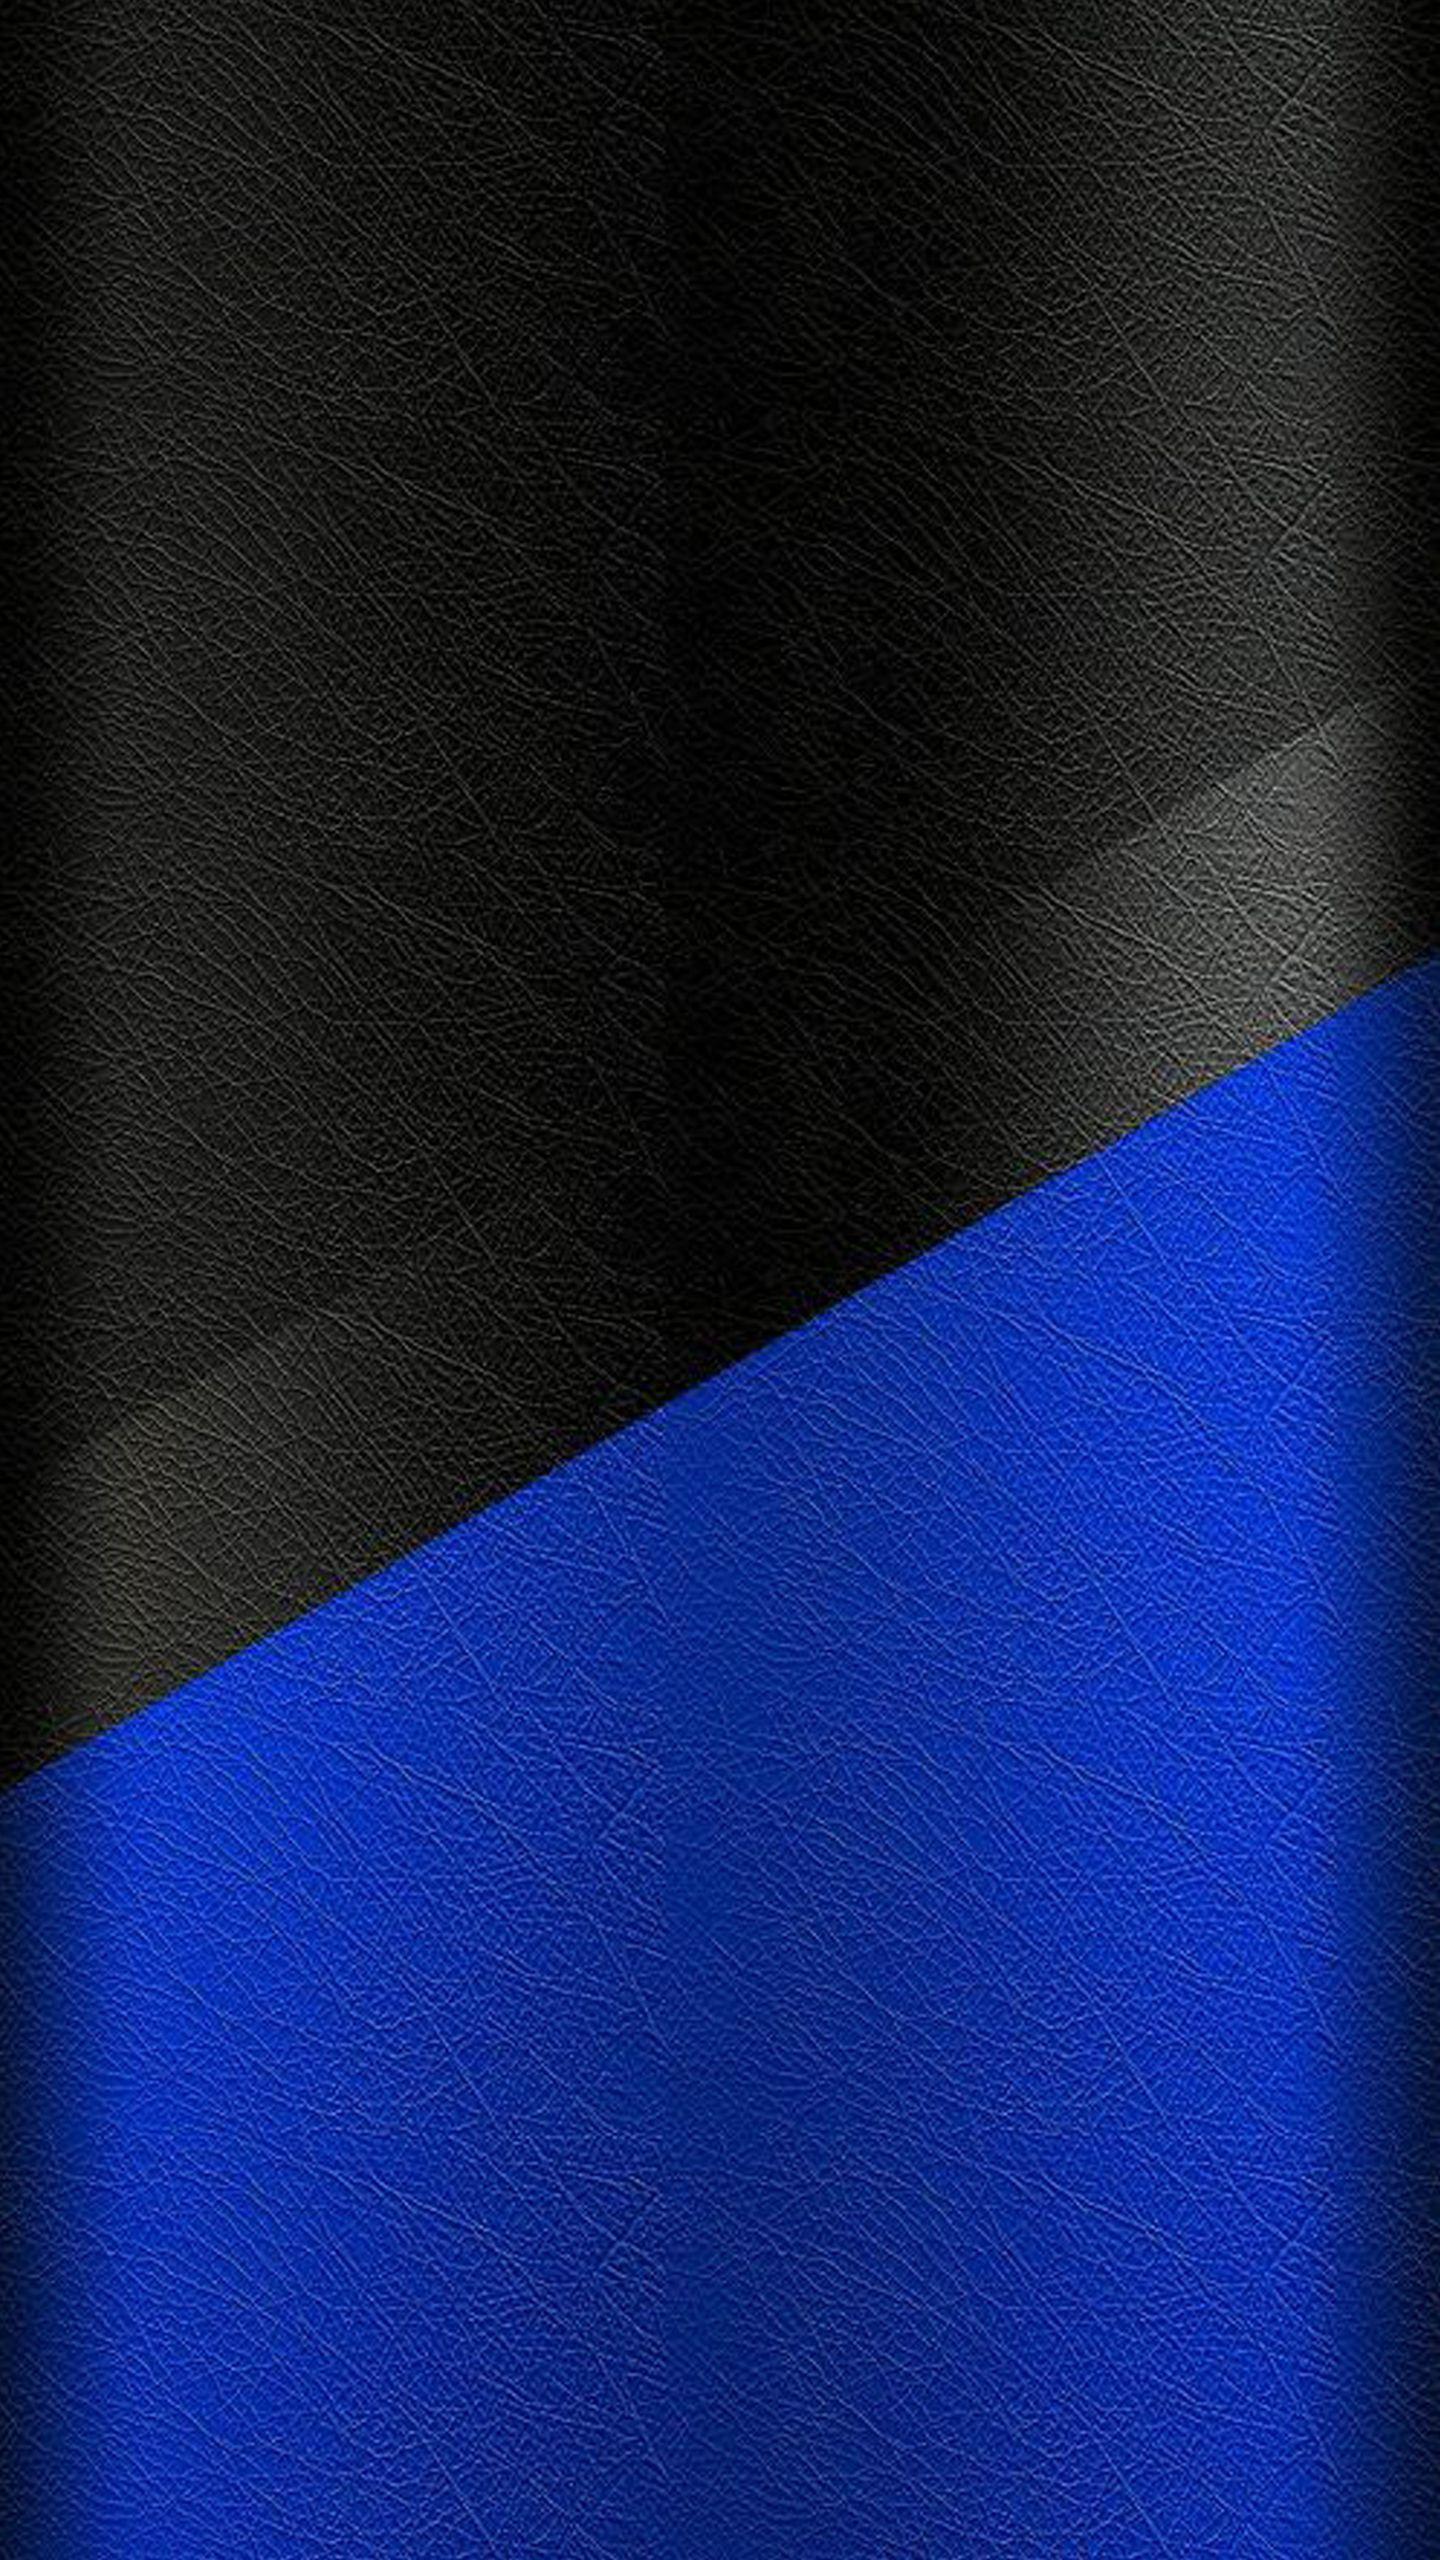 1440x2560 Wallpaper Dark Mywallpapers Site In 2020 Wallpaper Edge Samsung Galaxy Wallpaper Black And Blue Wallpaper